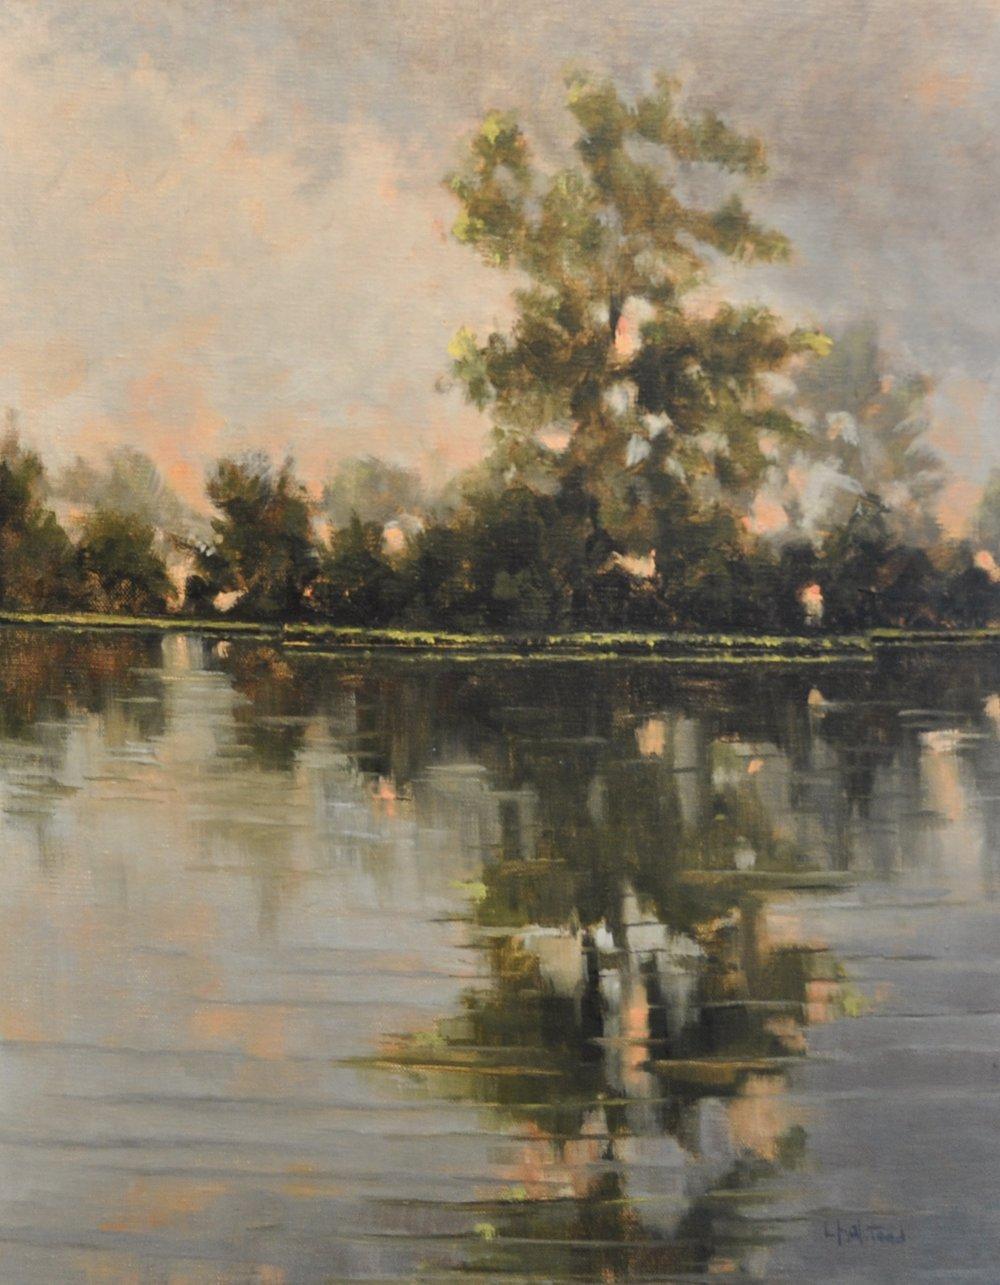 The Rain Passes, Oil on Linen, 11 x 14, available